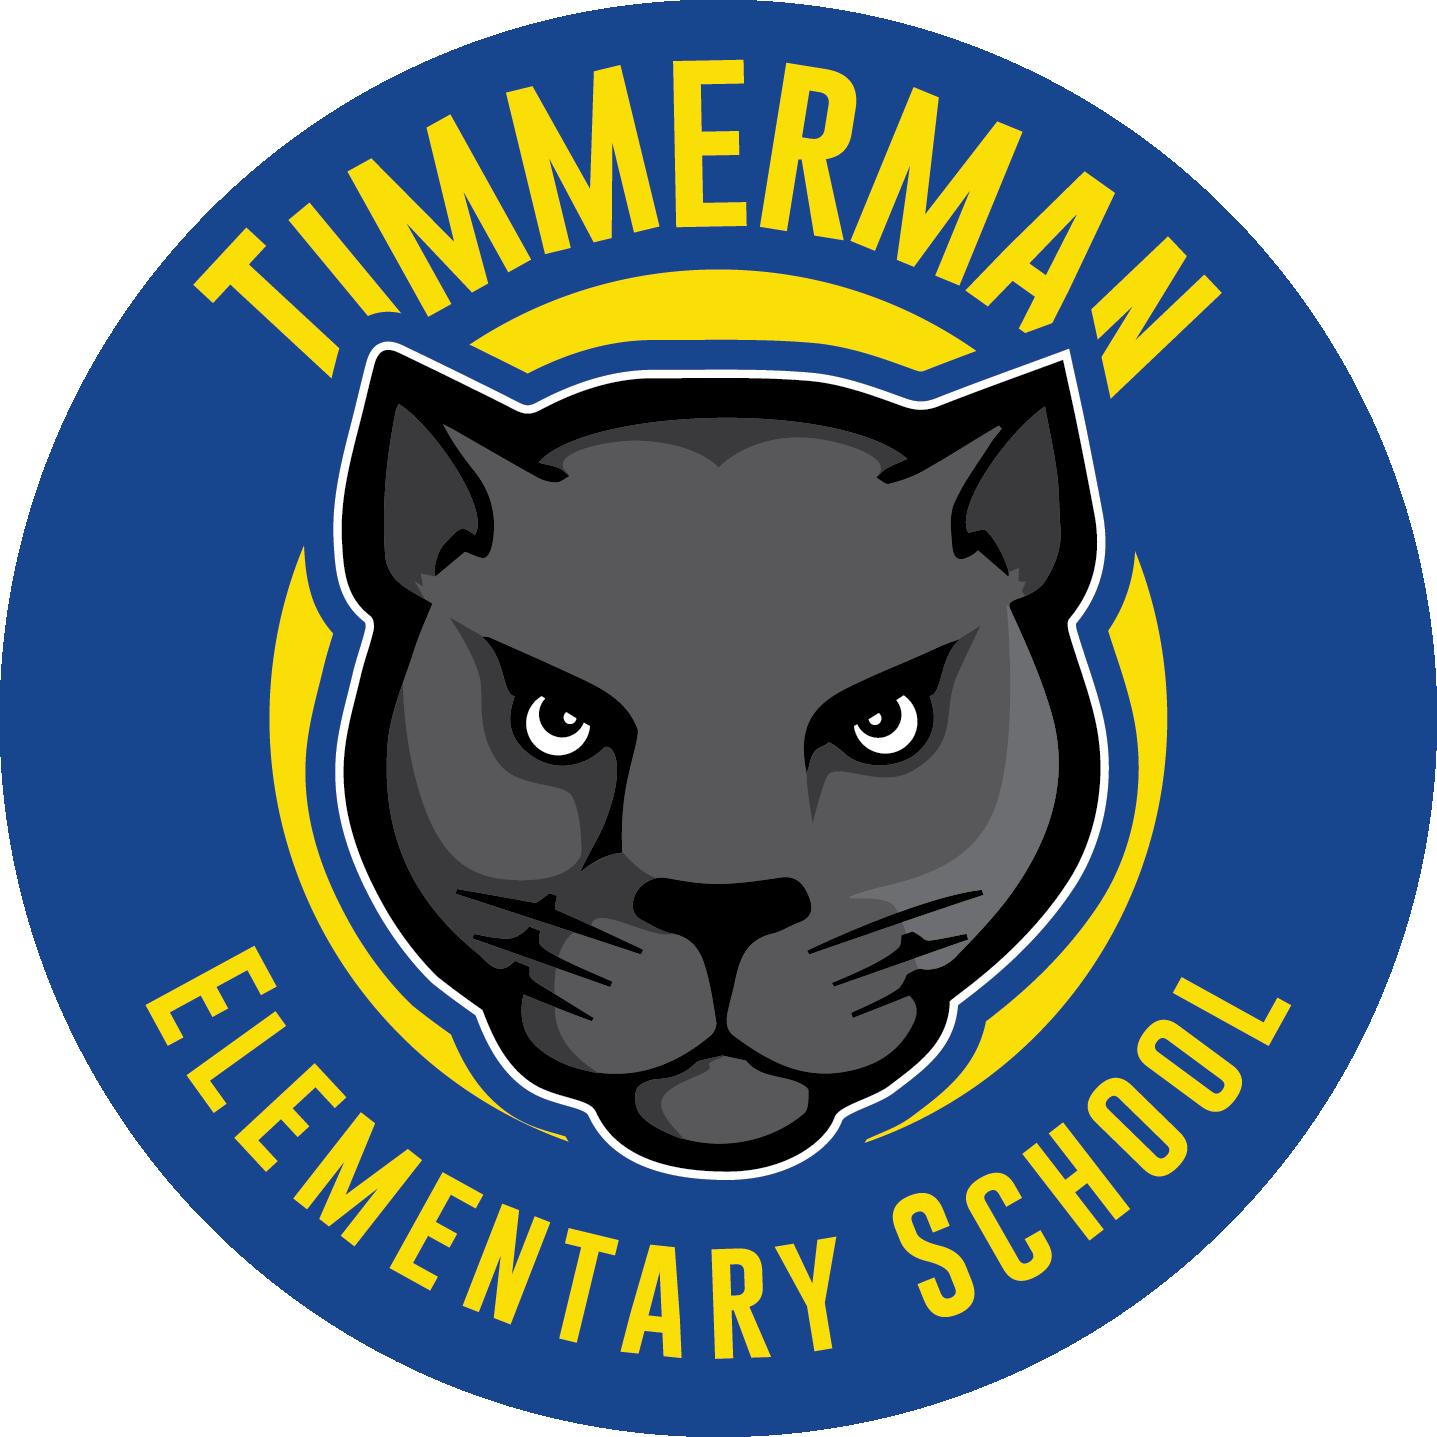 Timmerman elementary school homepage. Yearbook clipart camera logo